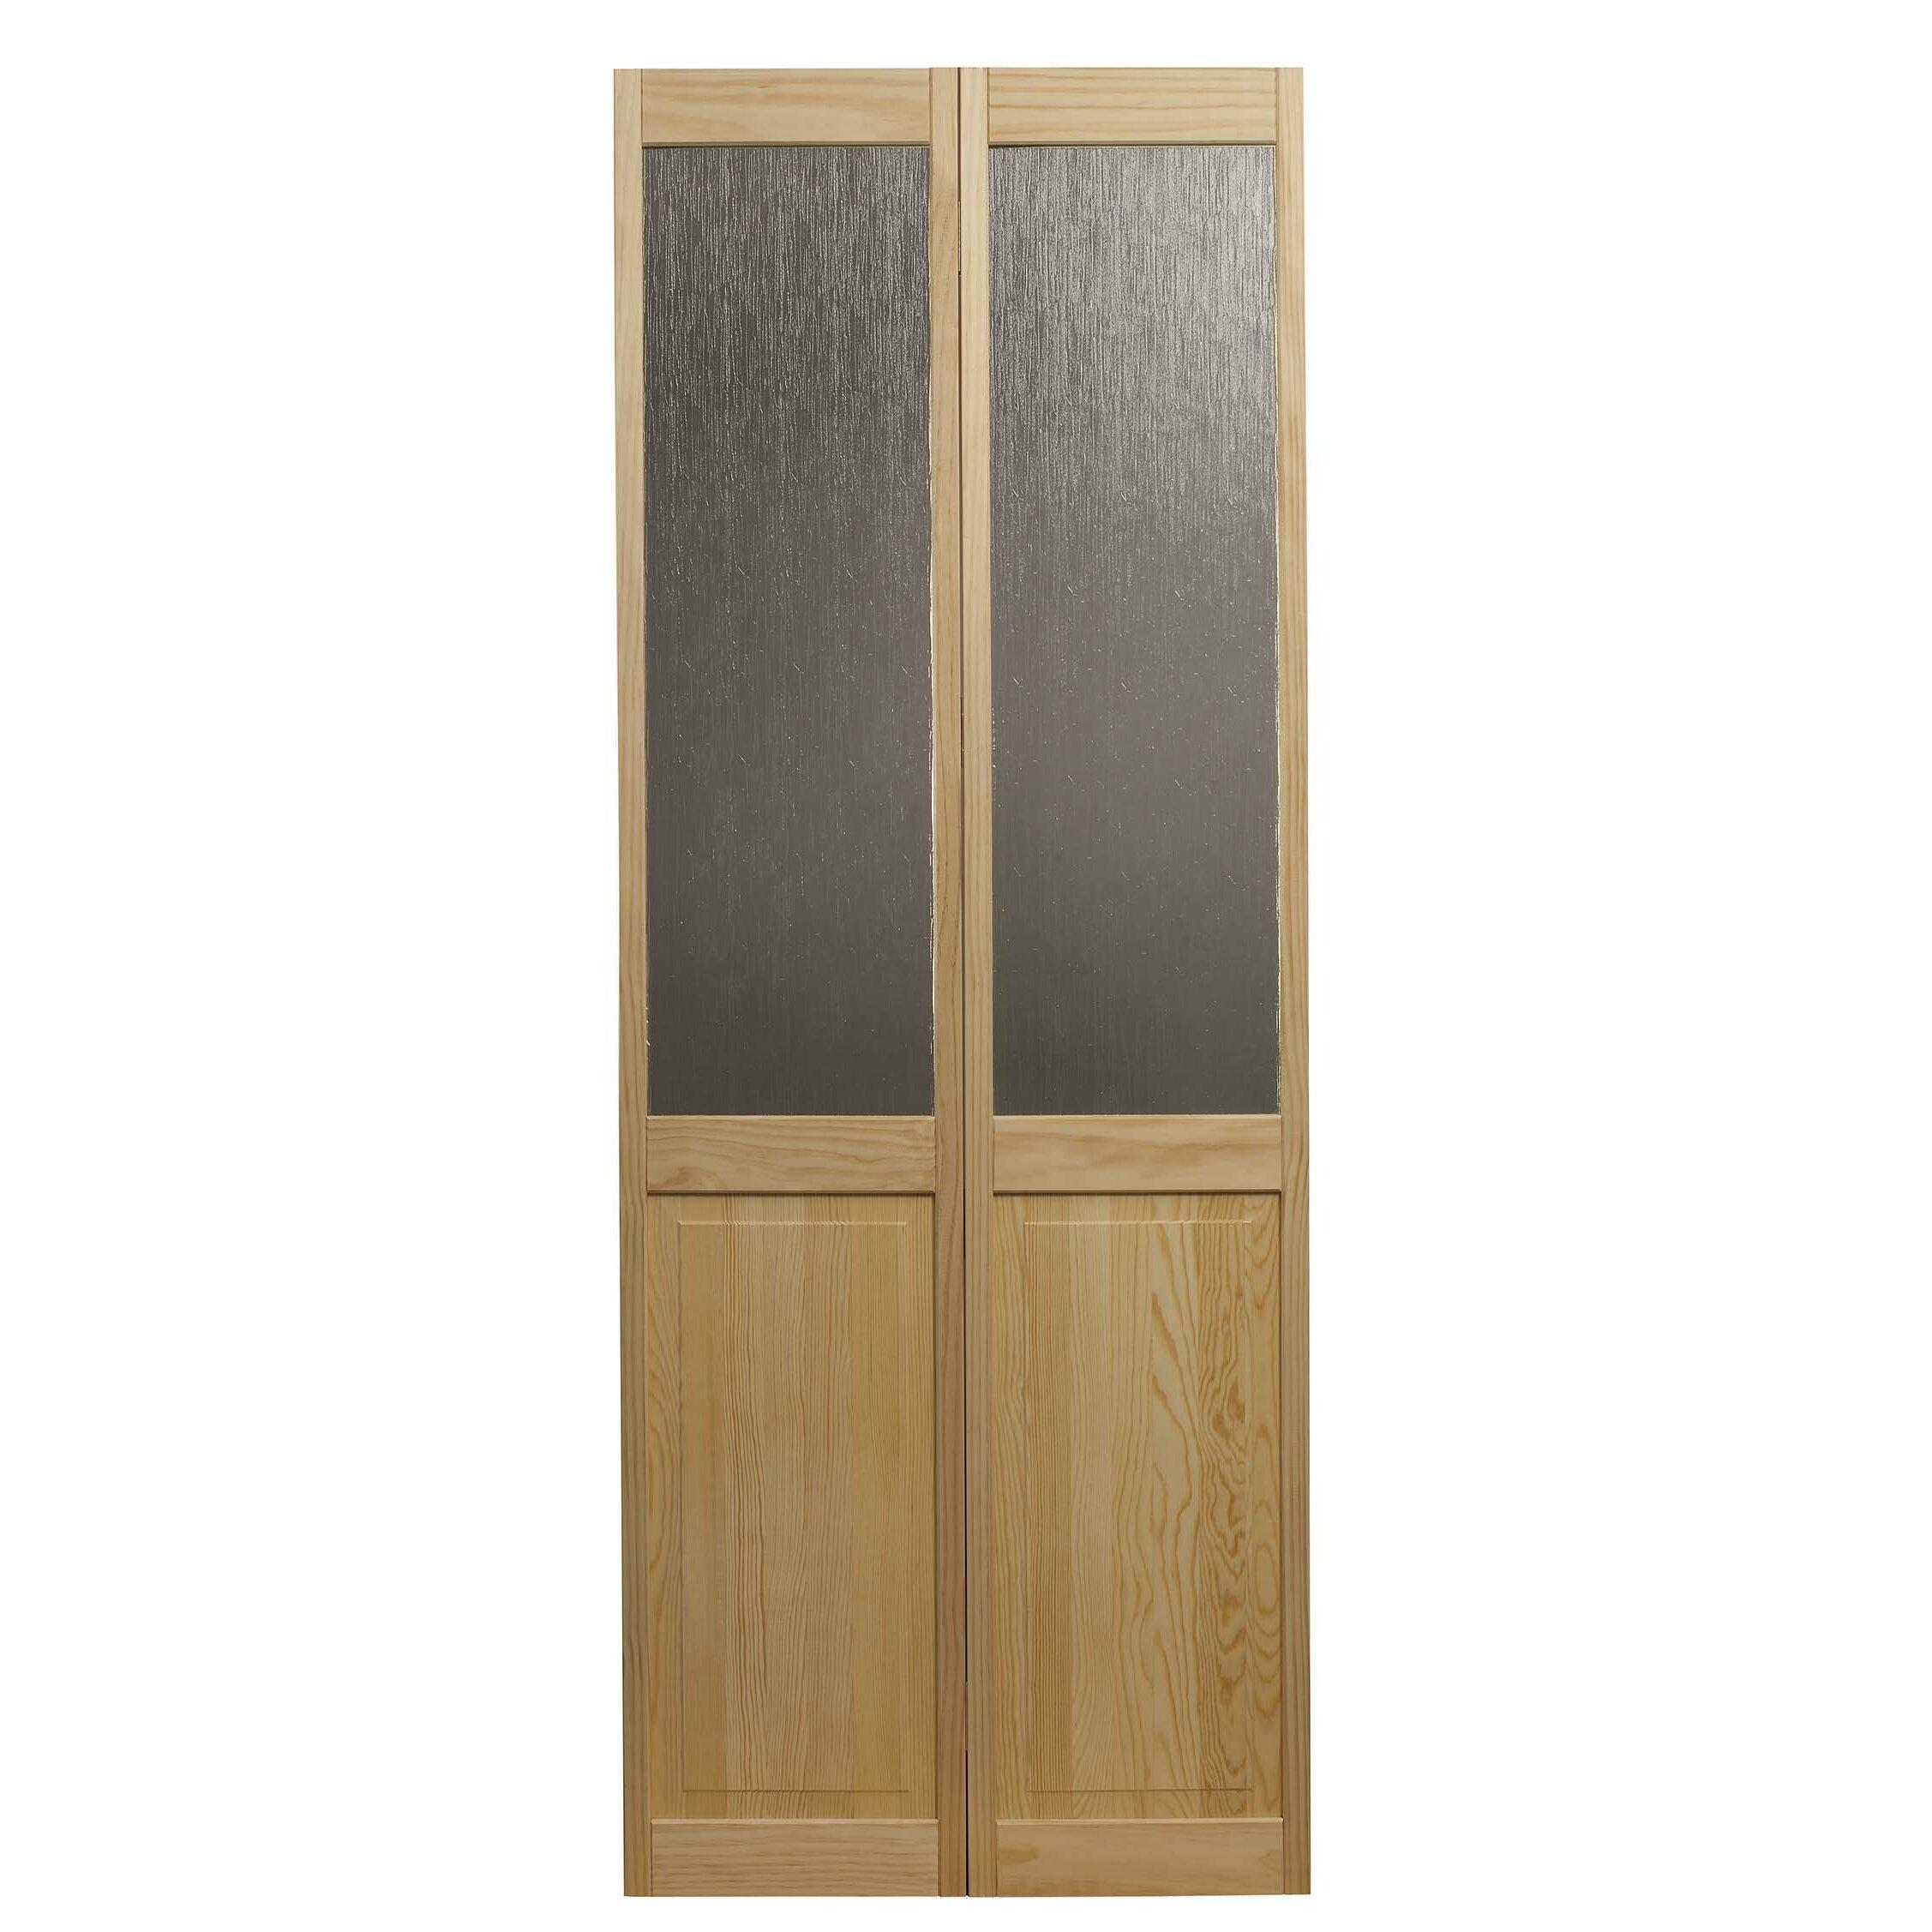 Ltl Bi Fold Doors Wood Unfinished Bi Fold Interior Door Reviews Wayfair